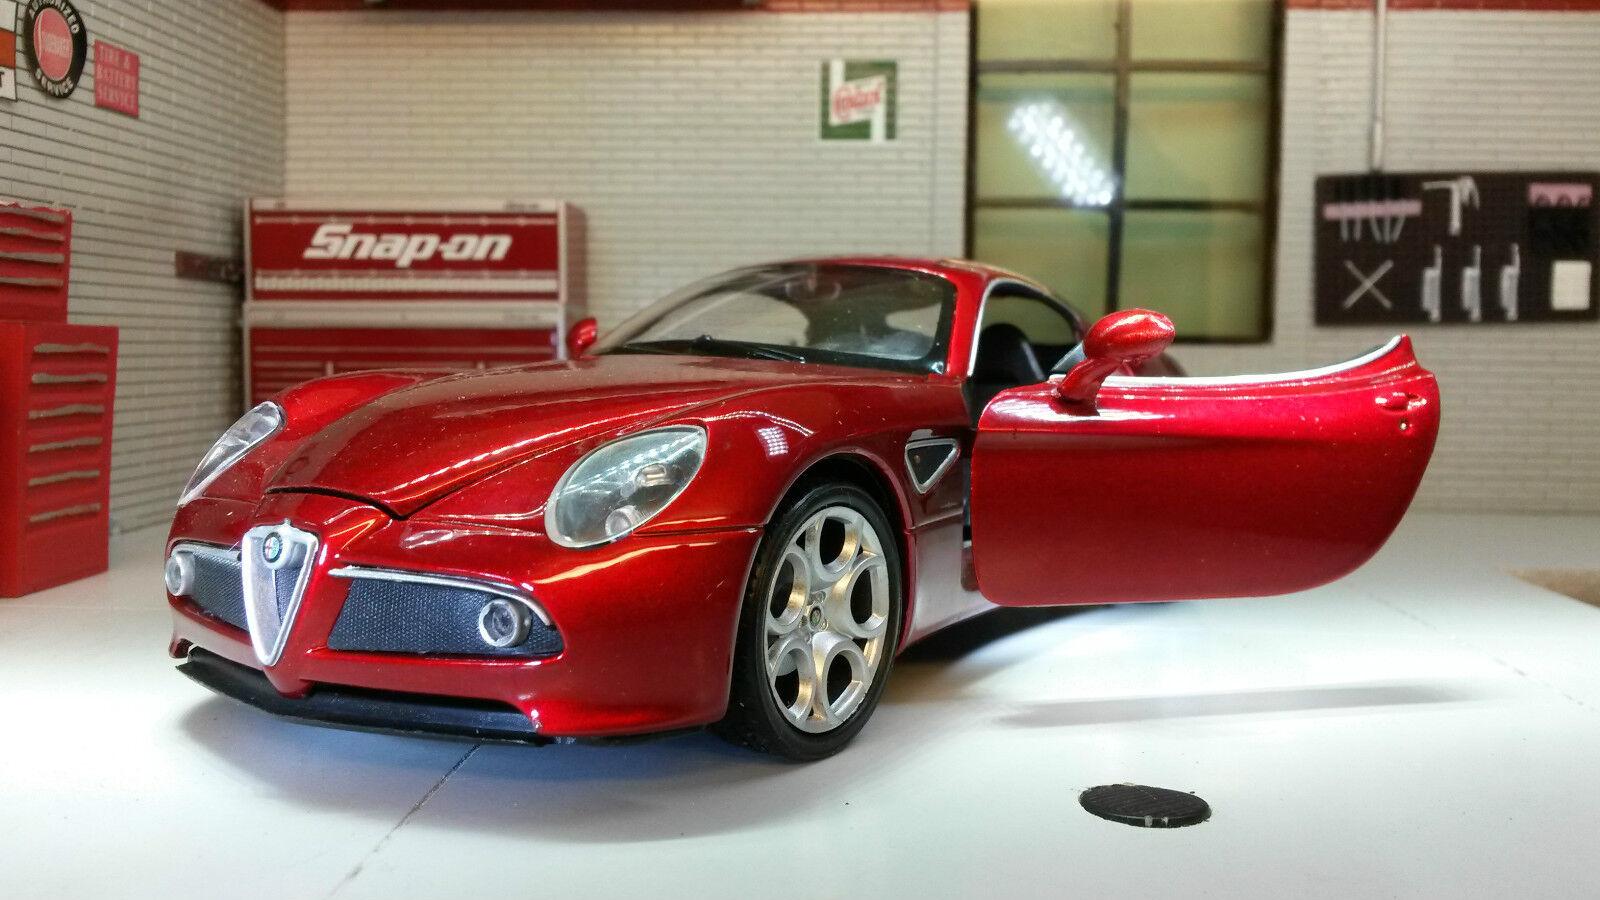 Modell Alfa Alfa Alfa Romeo 8C Competizione Coupe rot 1 24 Maßstab Welly 2006 Druckguss ea7172